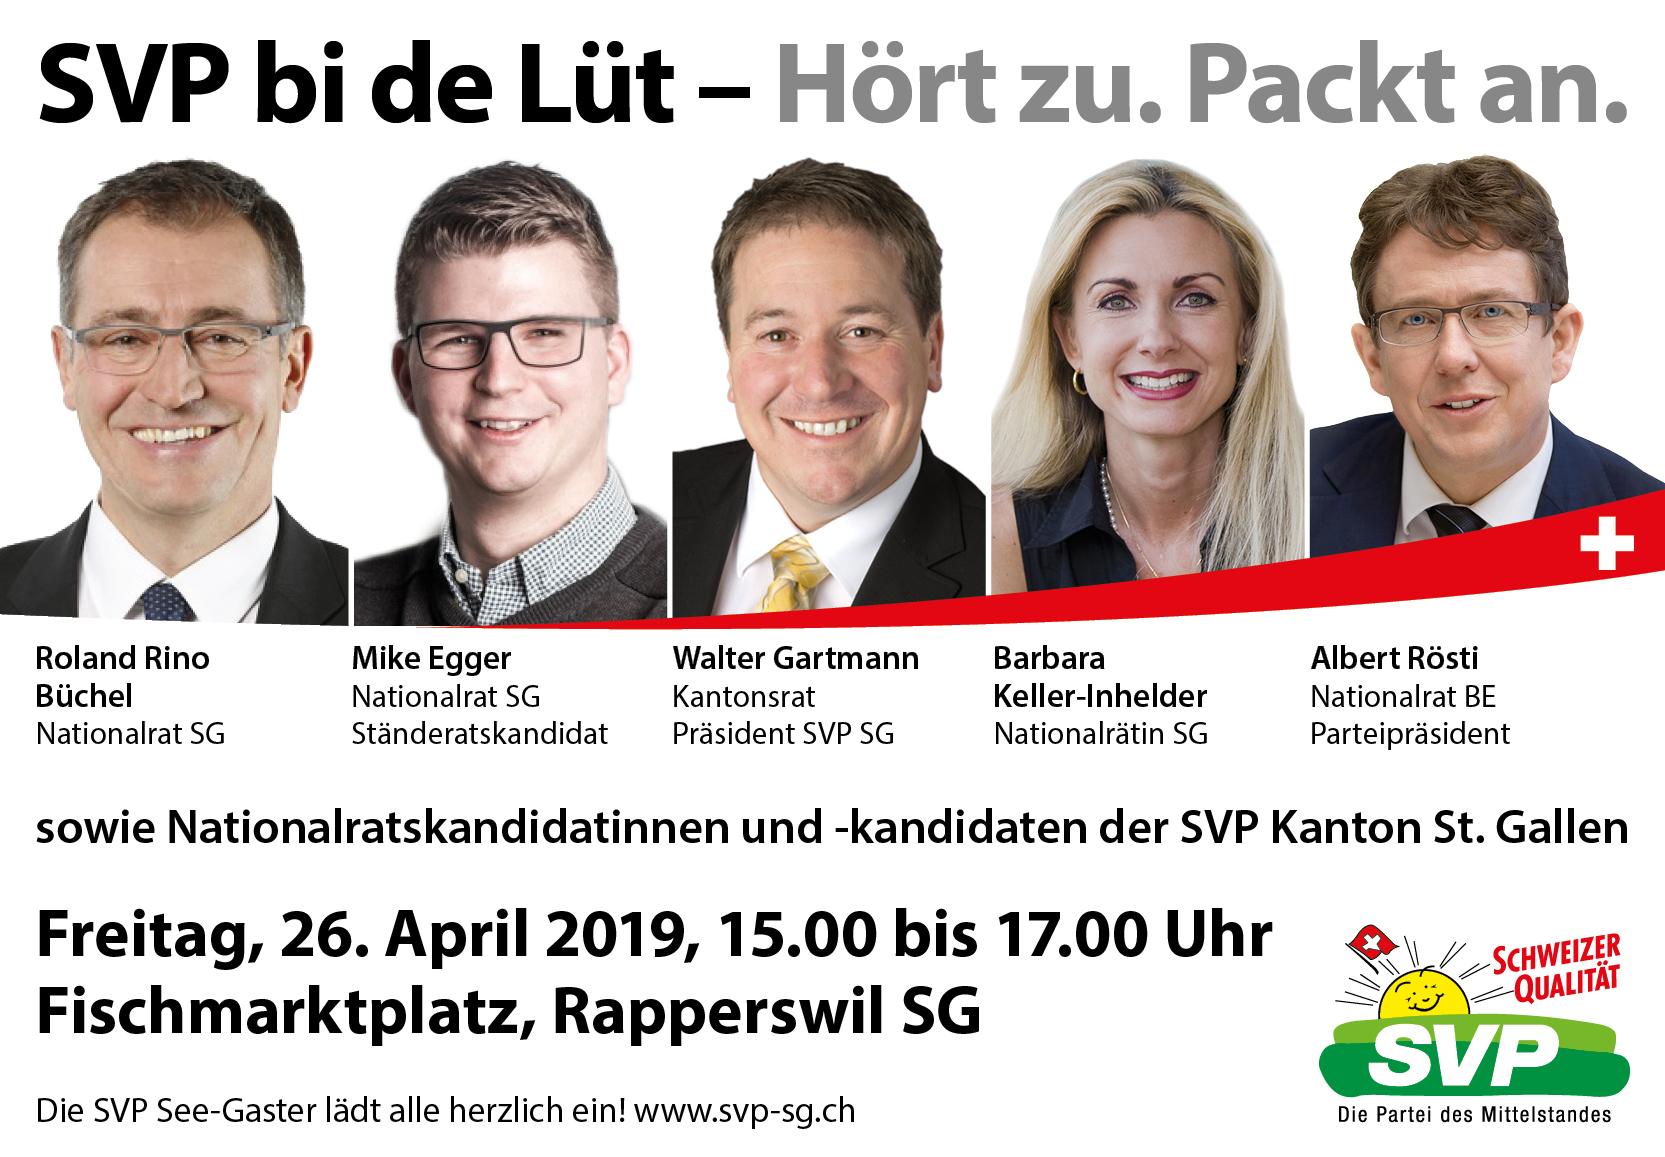 SVP bi de Lüt mit Albert Rösti (Freitag, 26.04.2019)